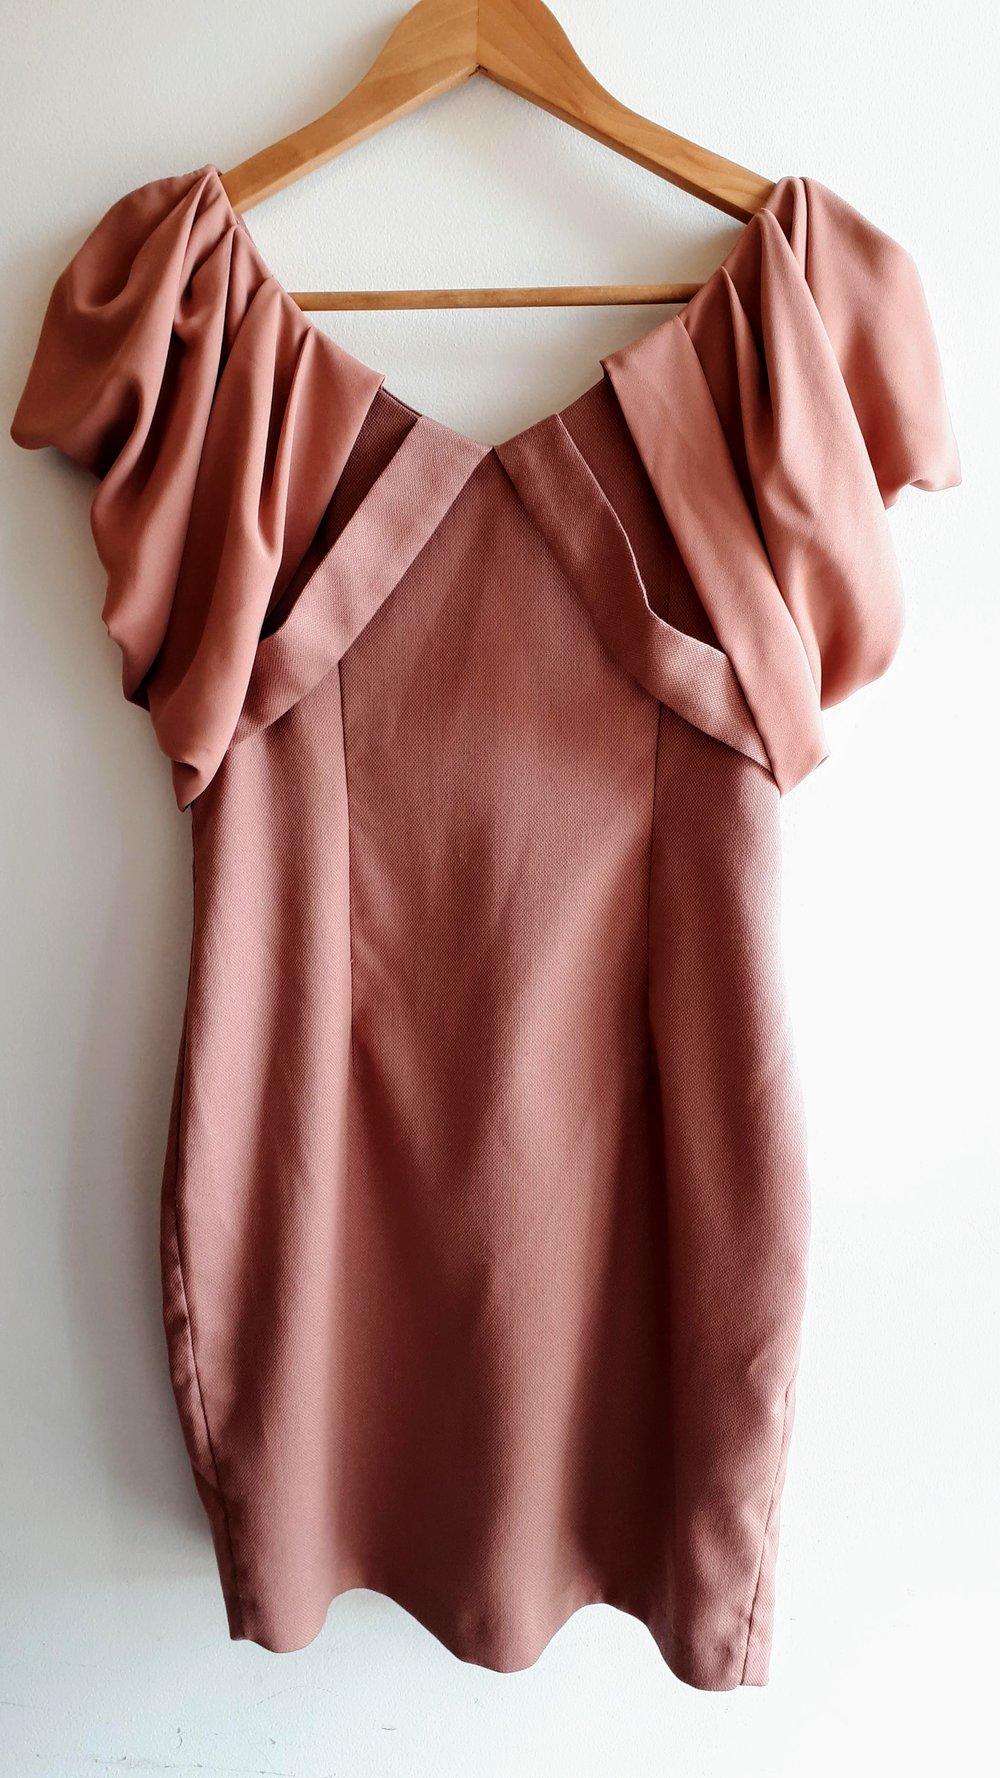 Loft 82 dress; Size S, $46